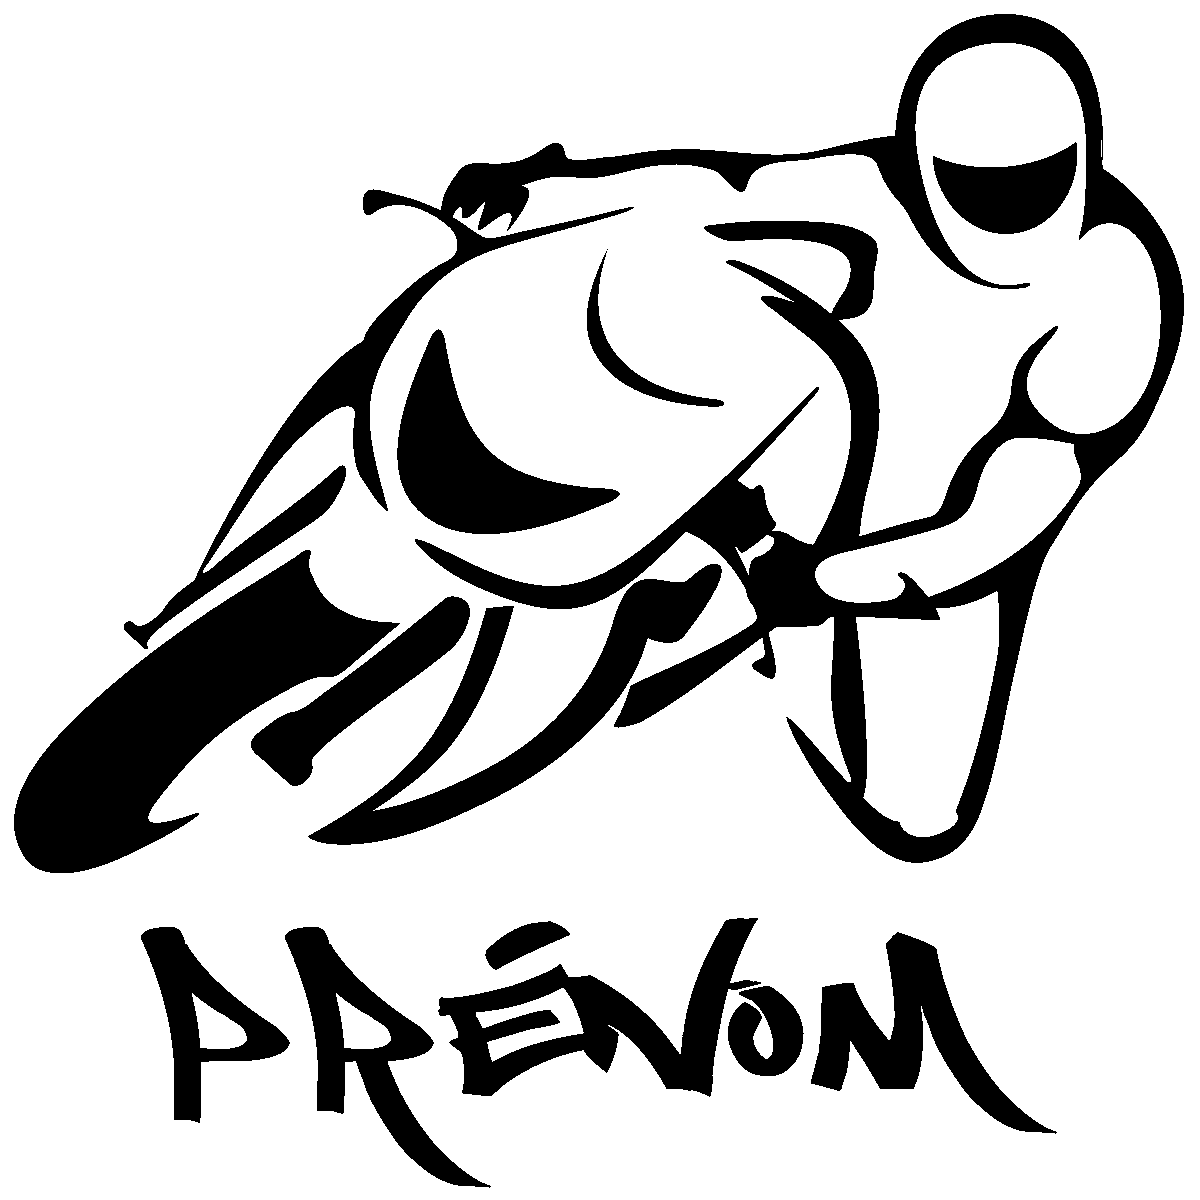 Stickers muraux prénom sticker prénom personnalisable moto de course ambiance sticker com